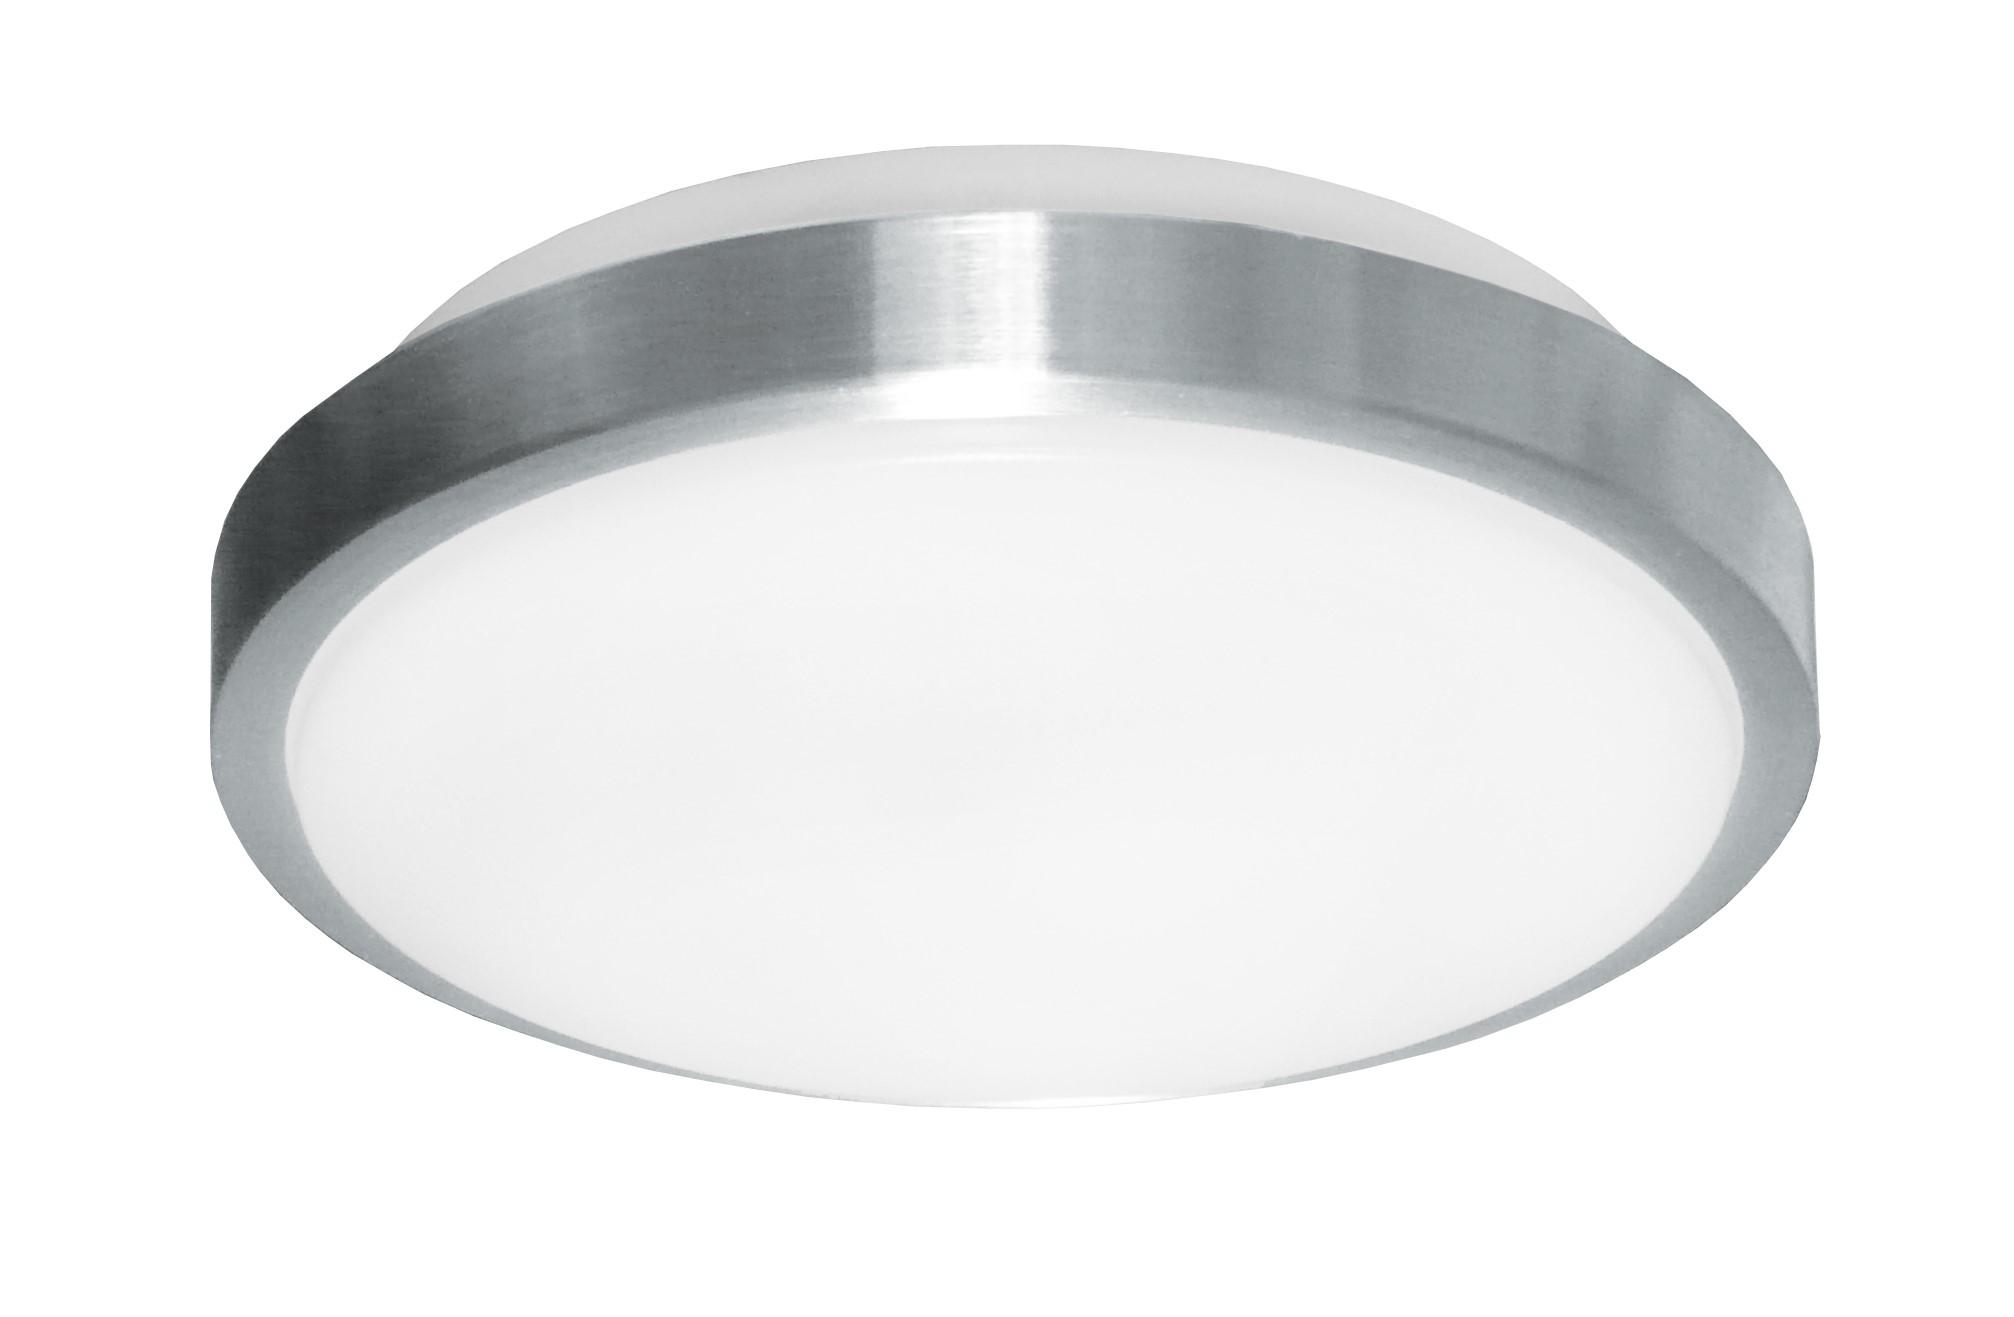 Plafoniera Led 12volt : Led deckenleuchte rechteckig beleuchtung interieur